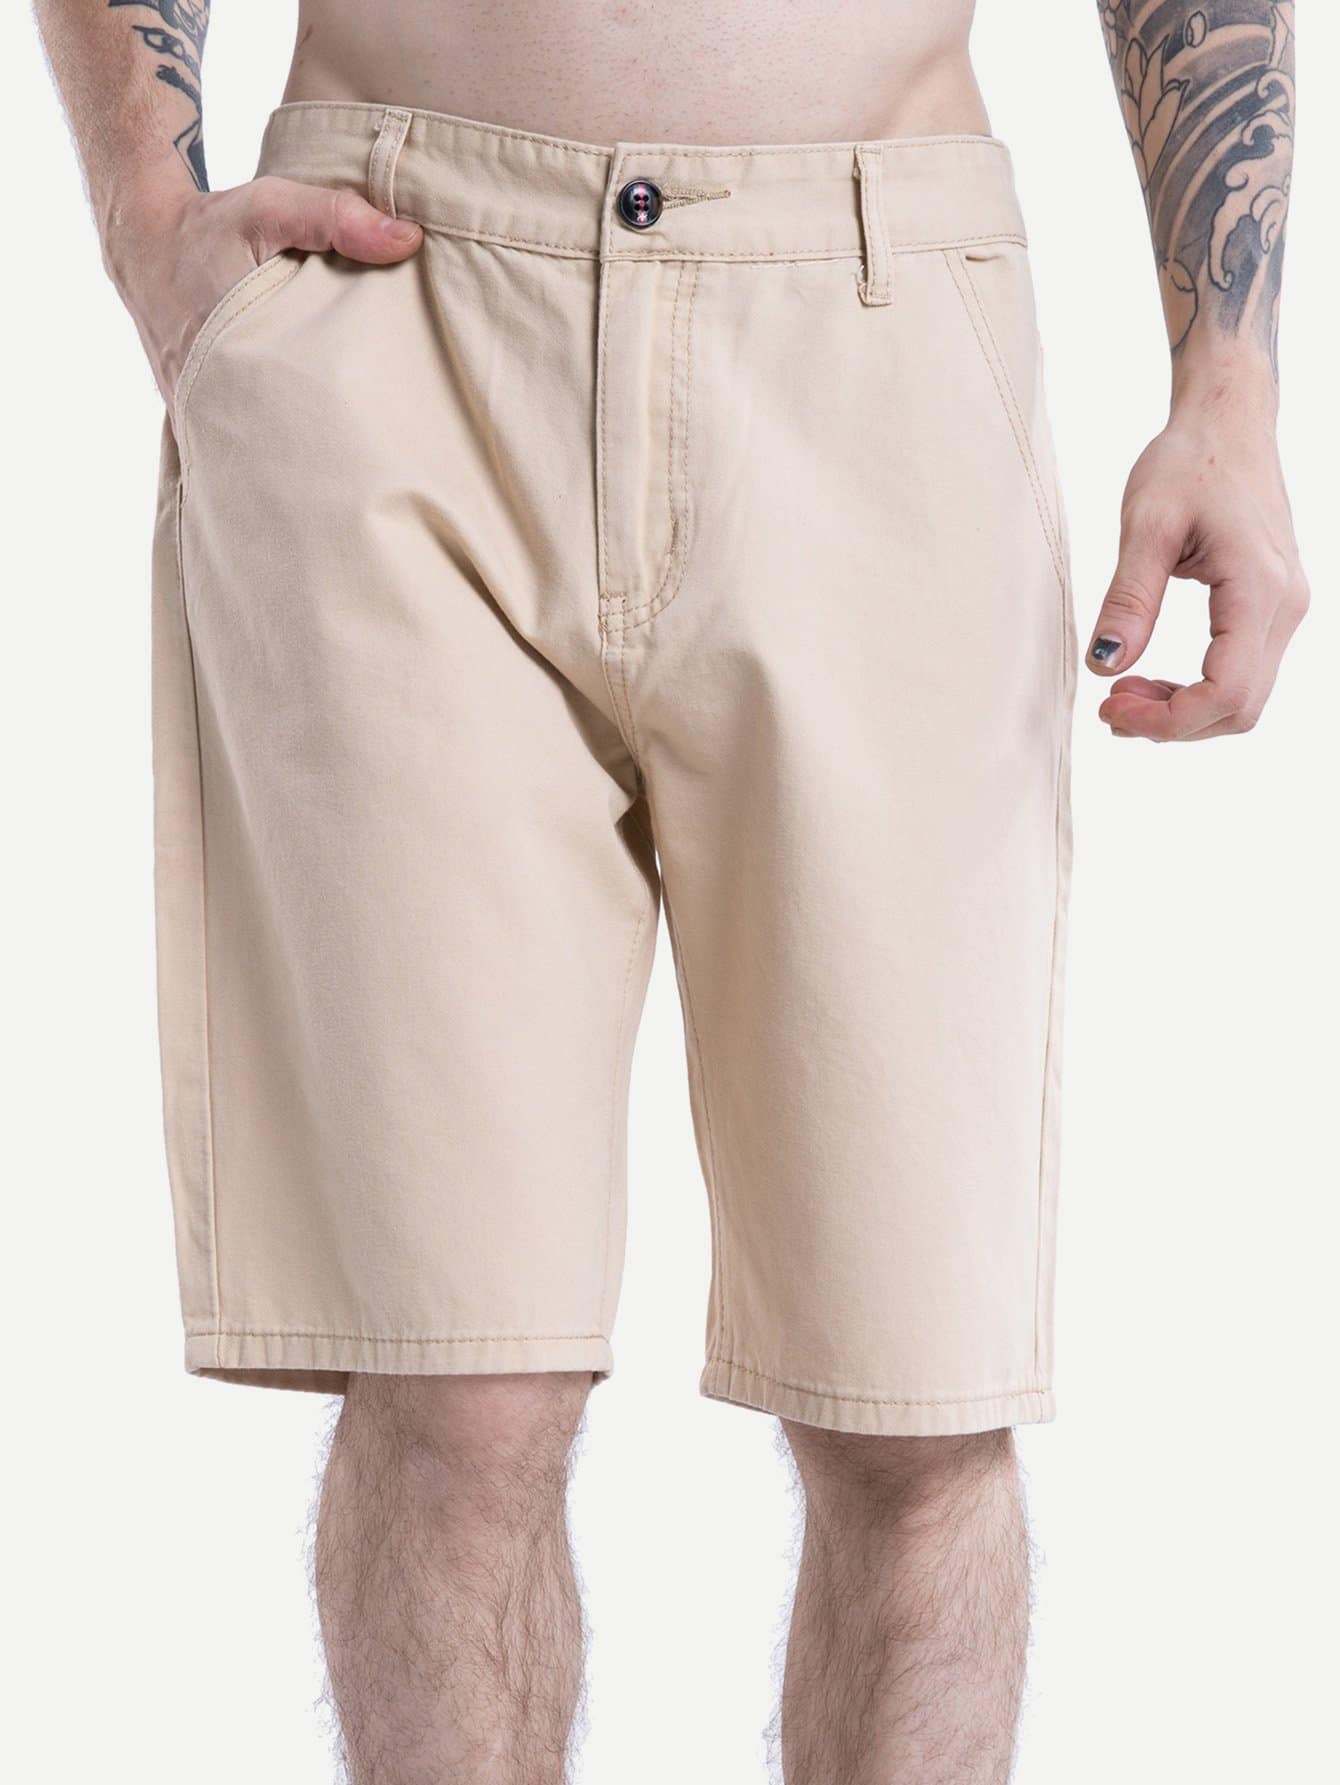 Men Cut And Sew Panel Shorts men cut and sew panel beach shorts